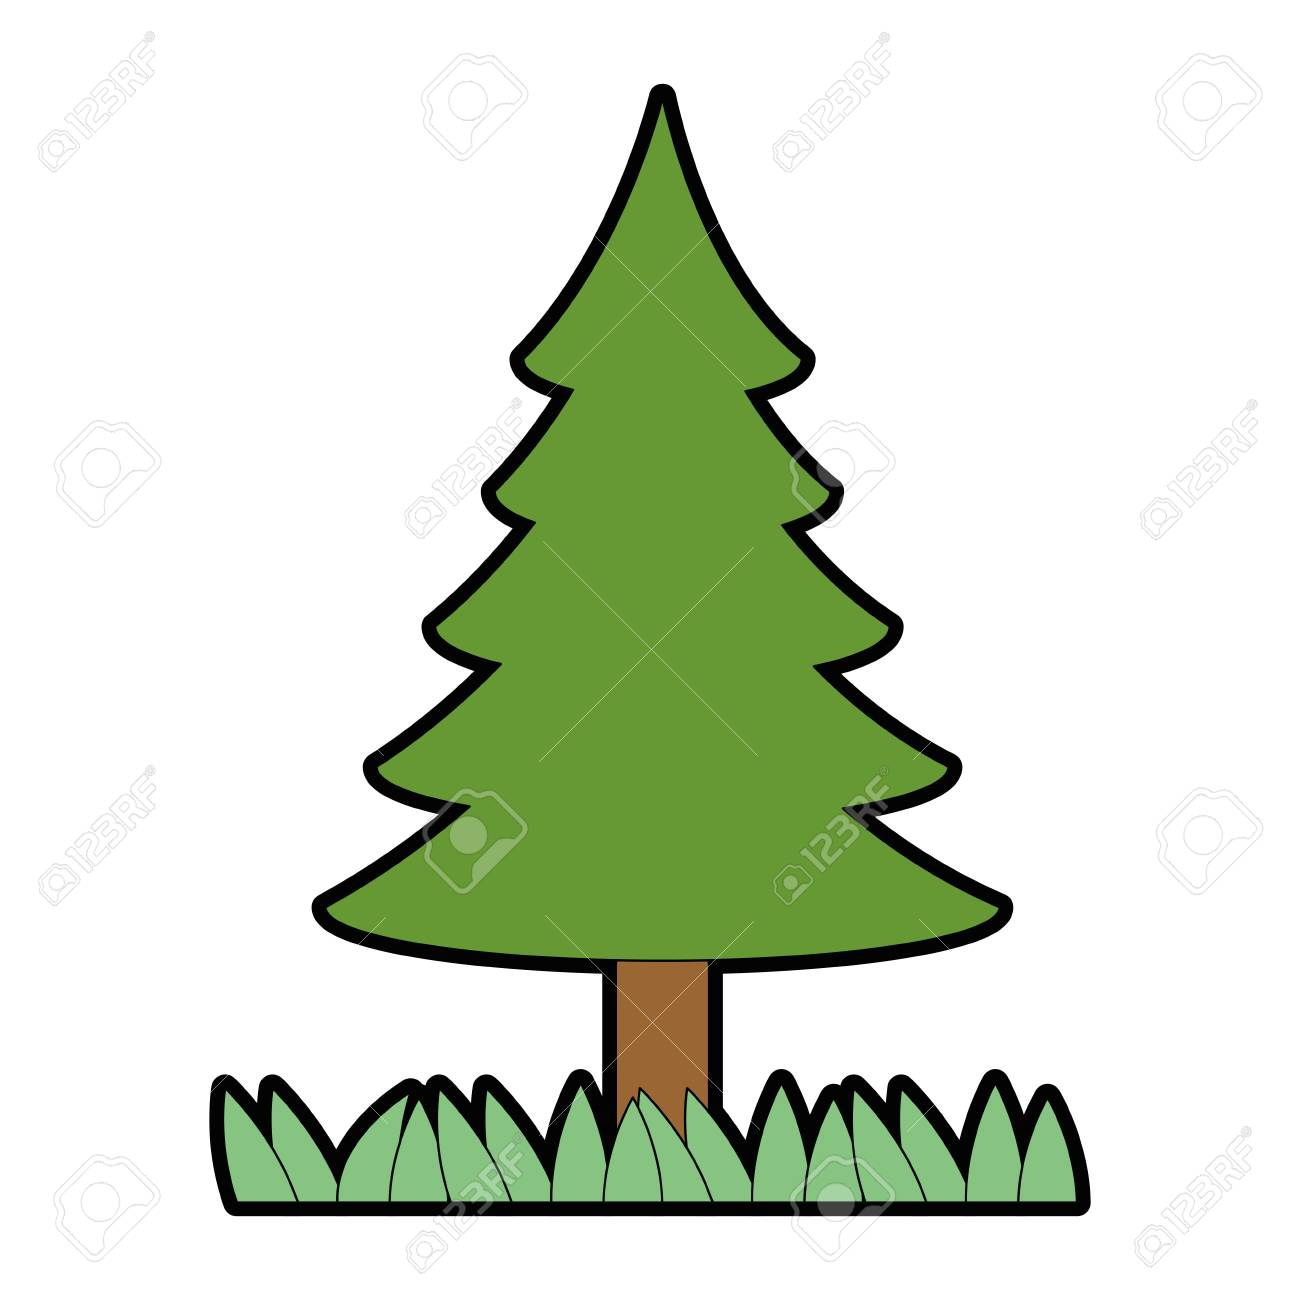 pine tree plant isolated icon vector illustration graphic design rh 123rf com pine tree graphic images pine tree branch graphic